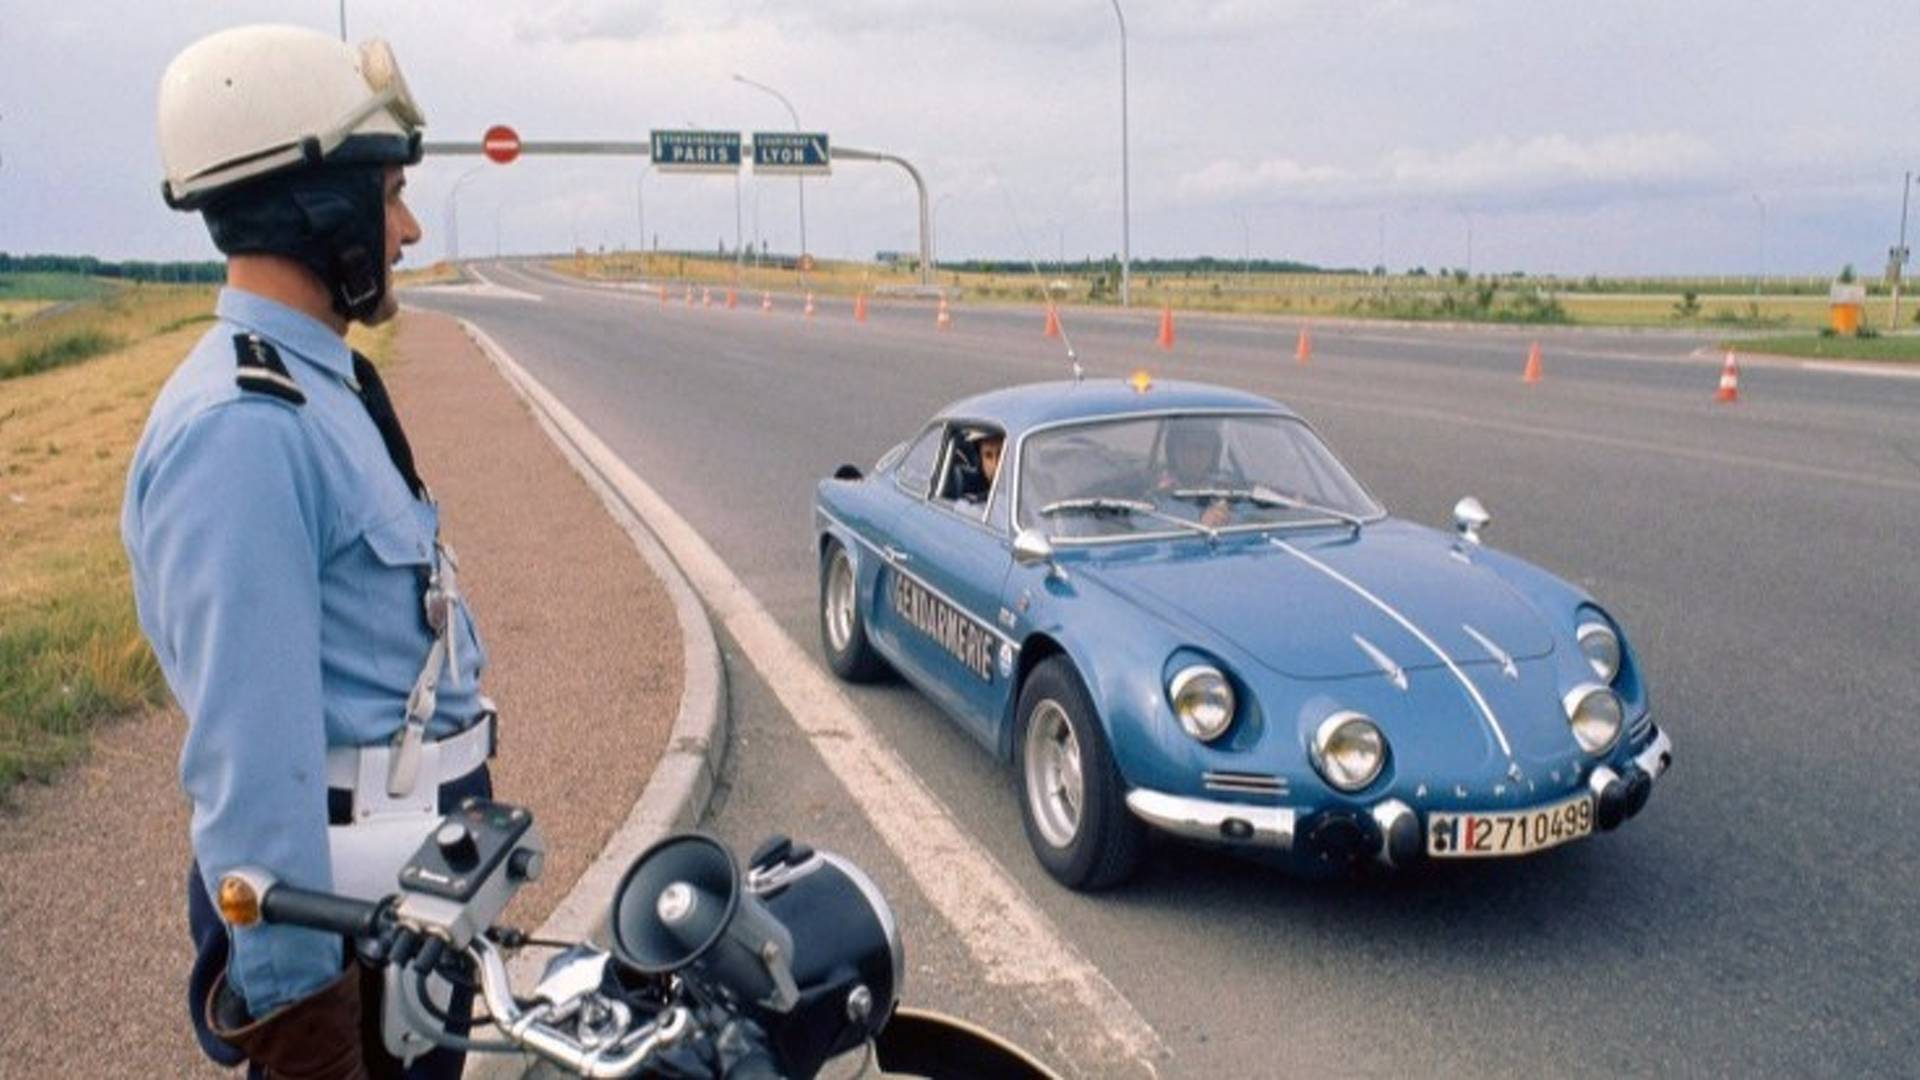 http://cdn.motor1.com/images/mgl/RXXog/s1/alpine-gendarmerie.jpg